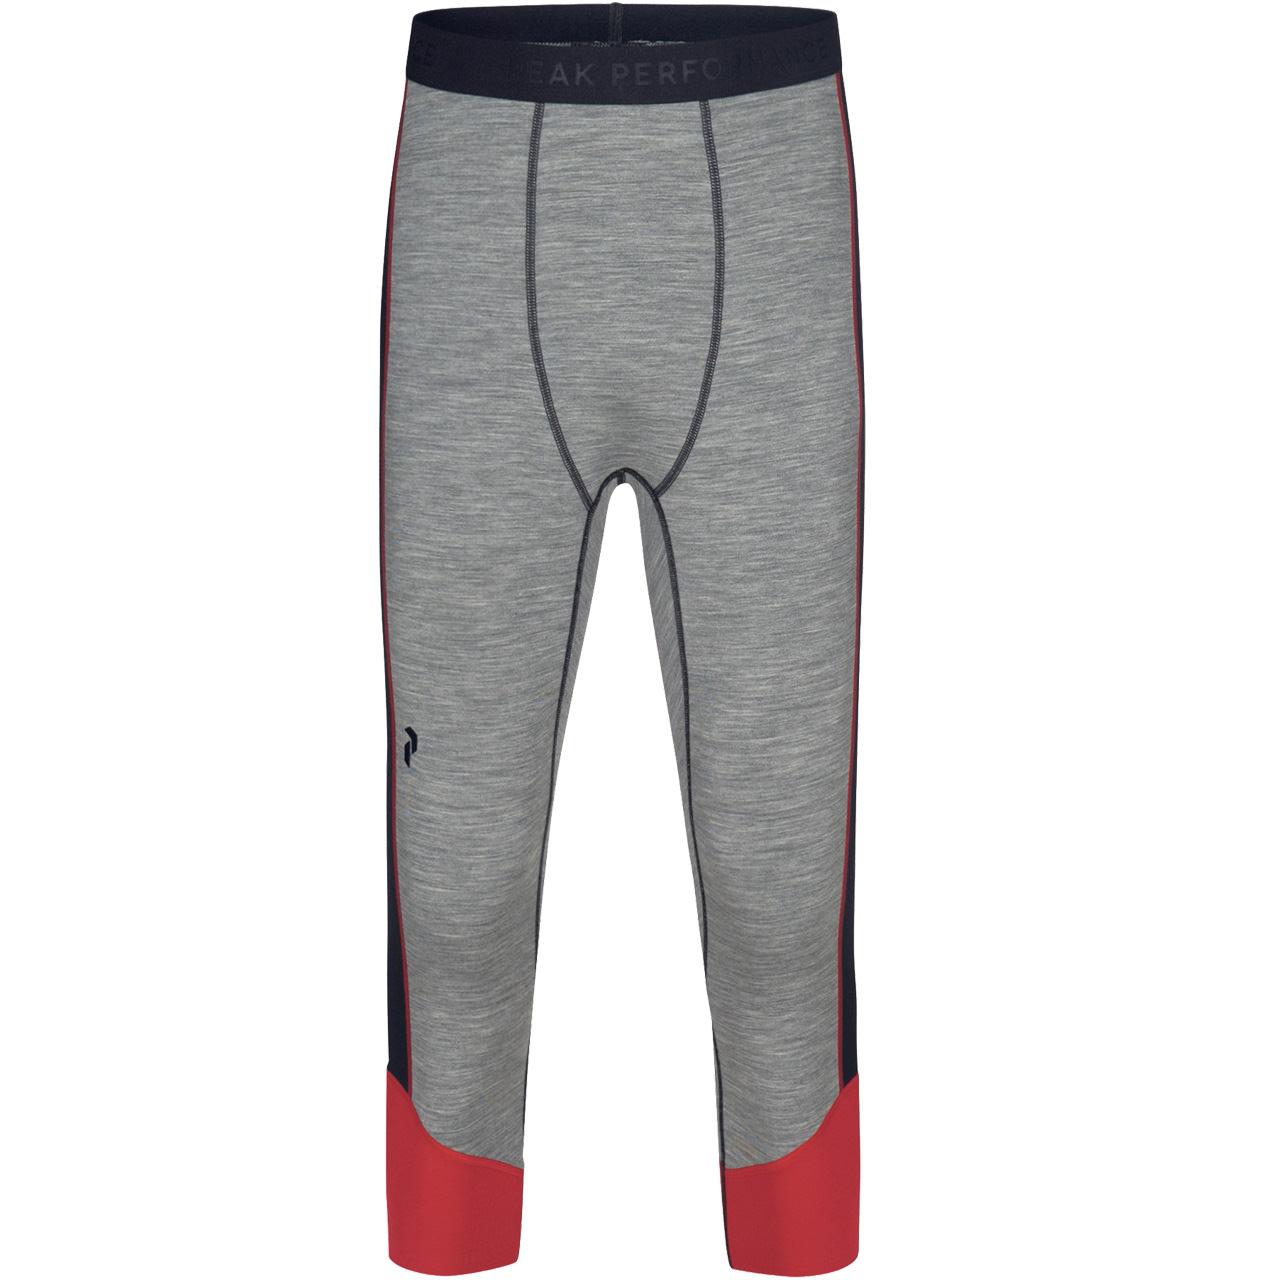 cheaper c92d7 60f8f Peak Performance Men 3/4 Pants MAGIC grey melange